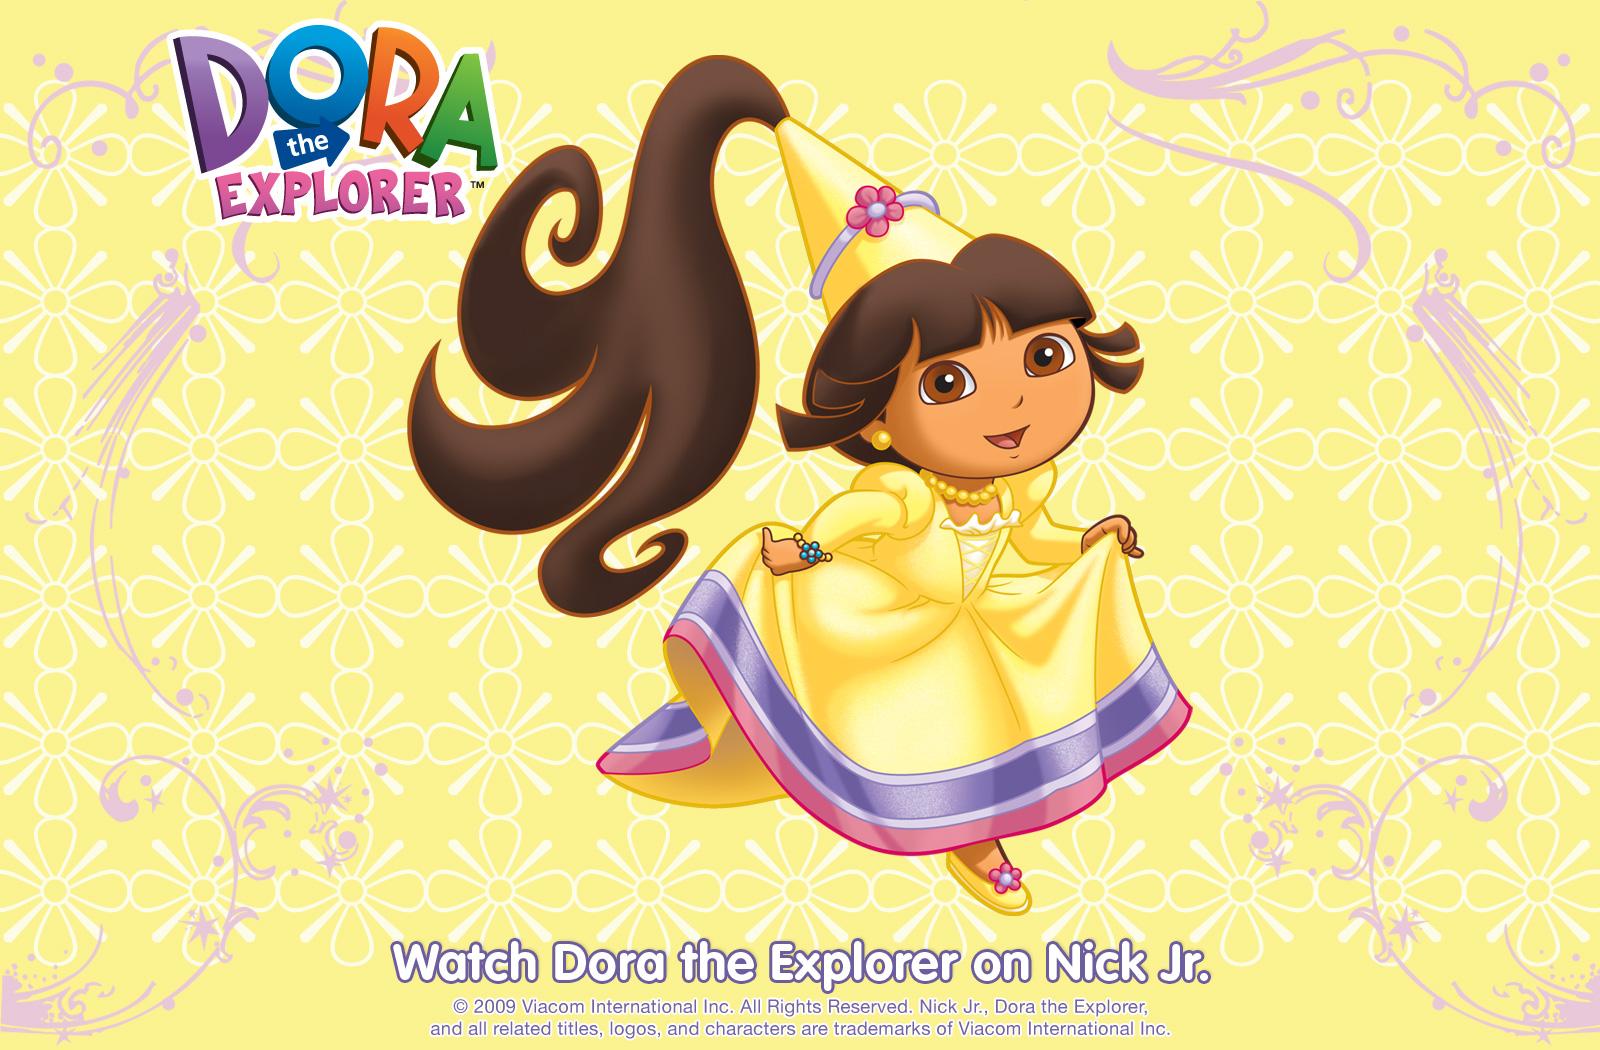 http://3.bp.blogspot.com/-NXeWsdouFzA/TfHGOA8UkJI/AAAAAAAAKpo/ITO71pvj0Ss/s1600/dora-fairy-wallpaper-wide.jpg